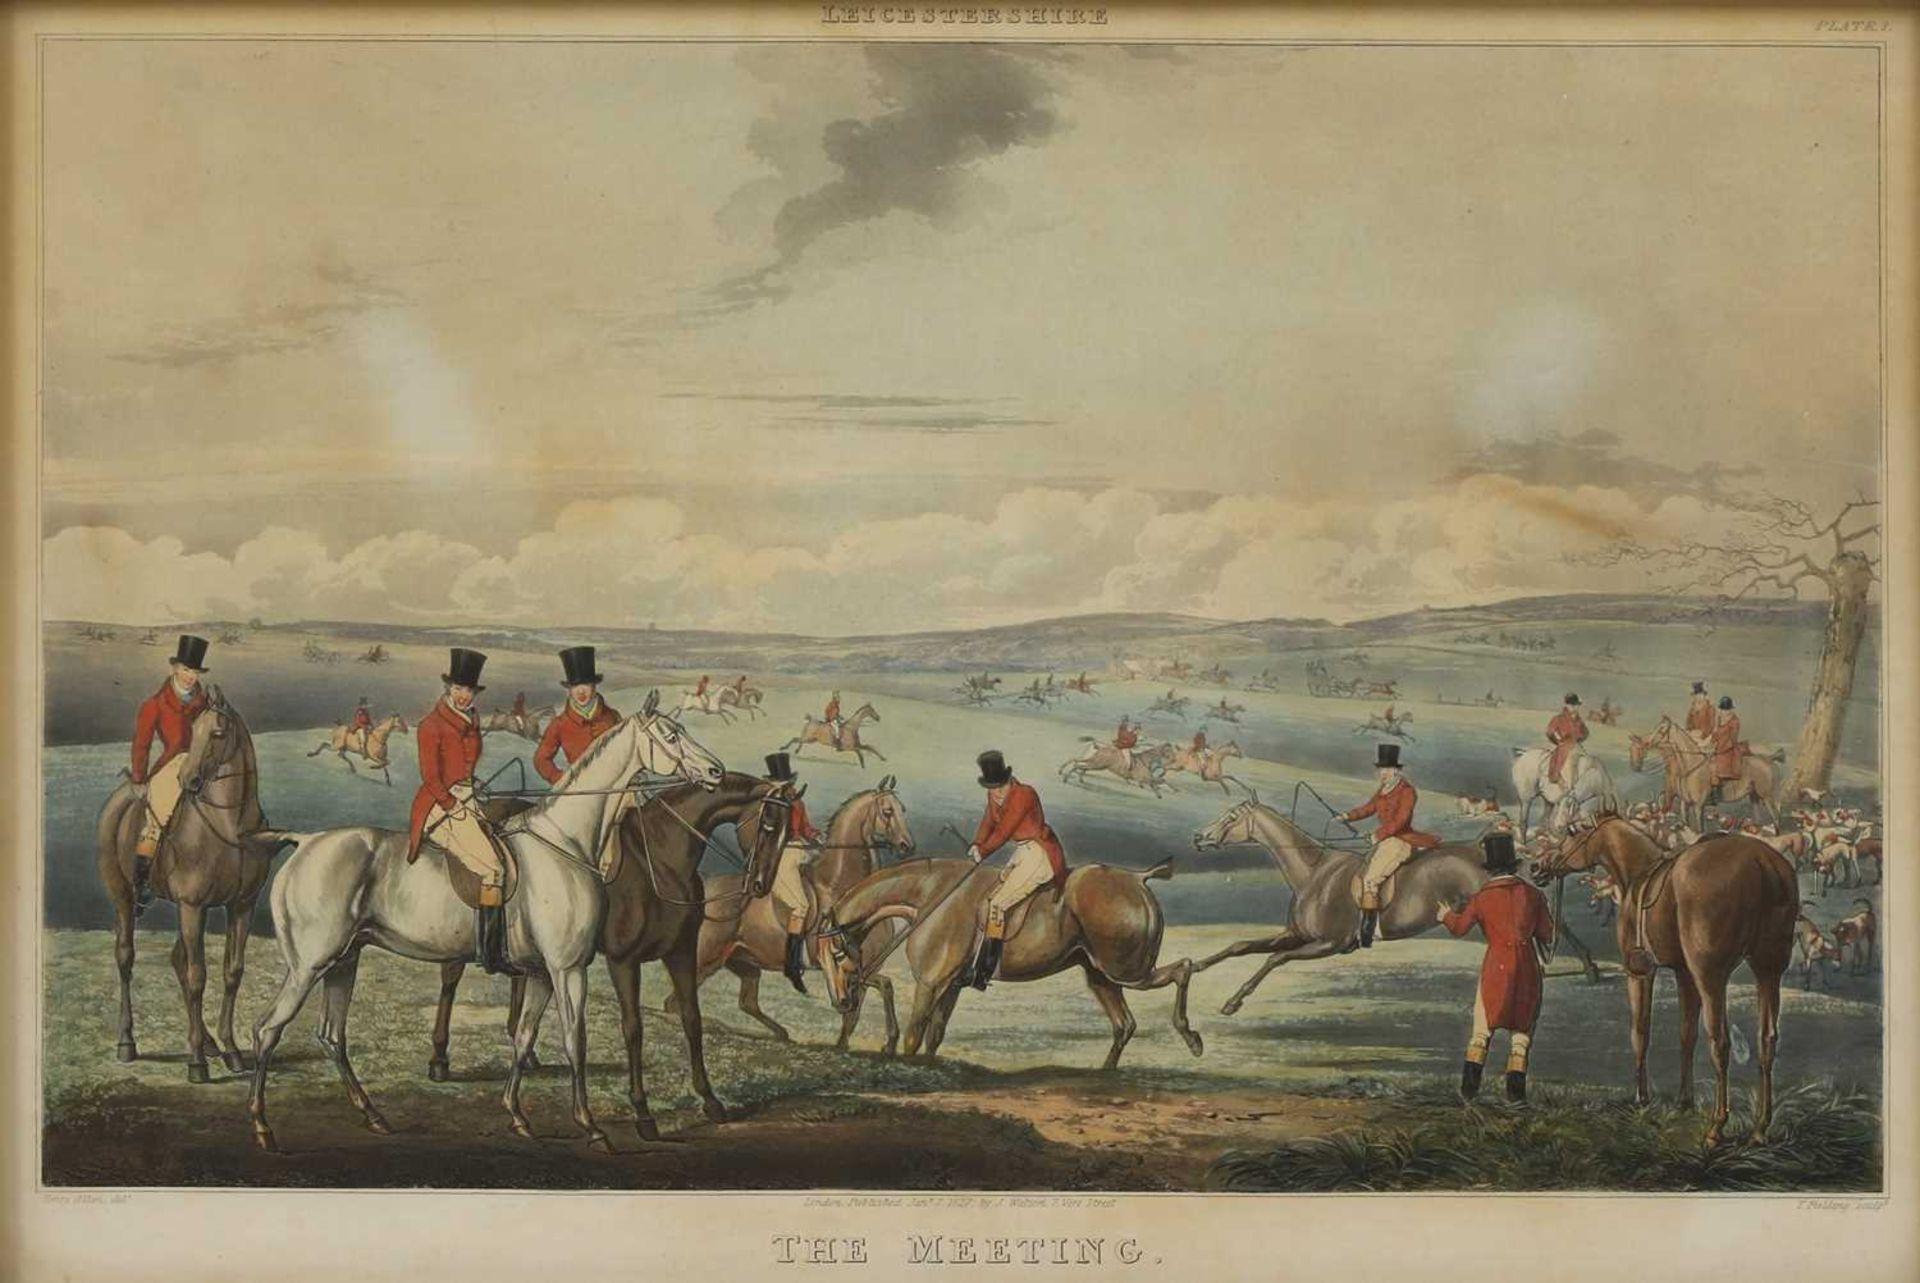 Thomas Fielding (1758-1820), after Henry Thomas Alken (1785-1851)